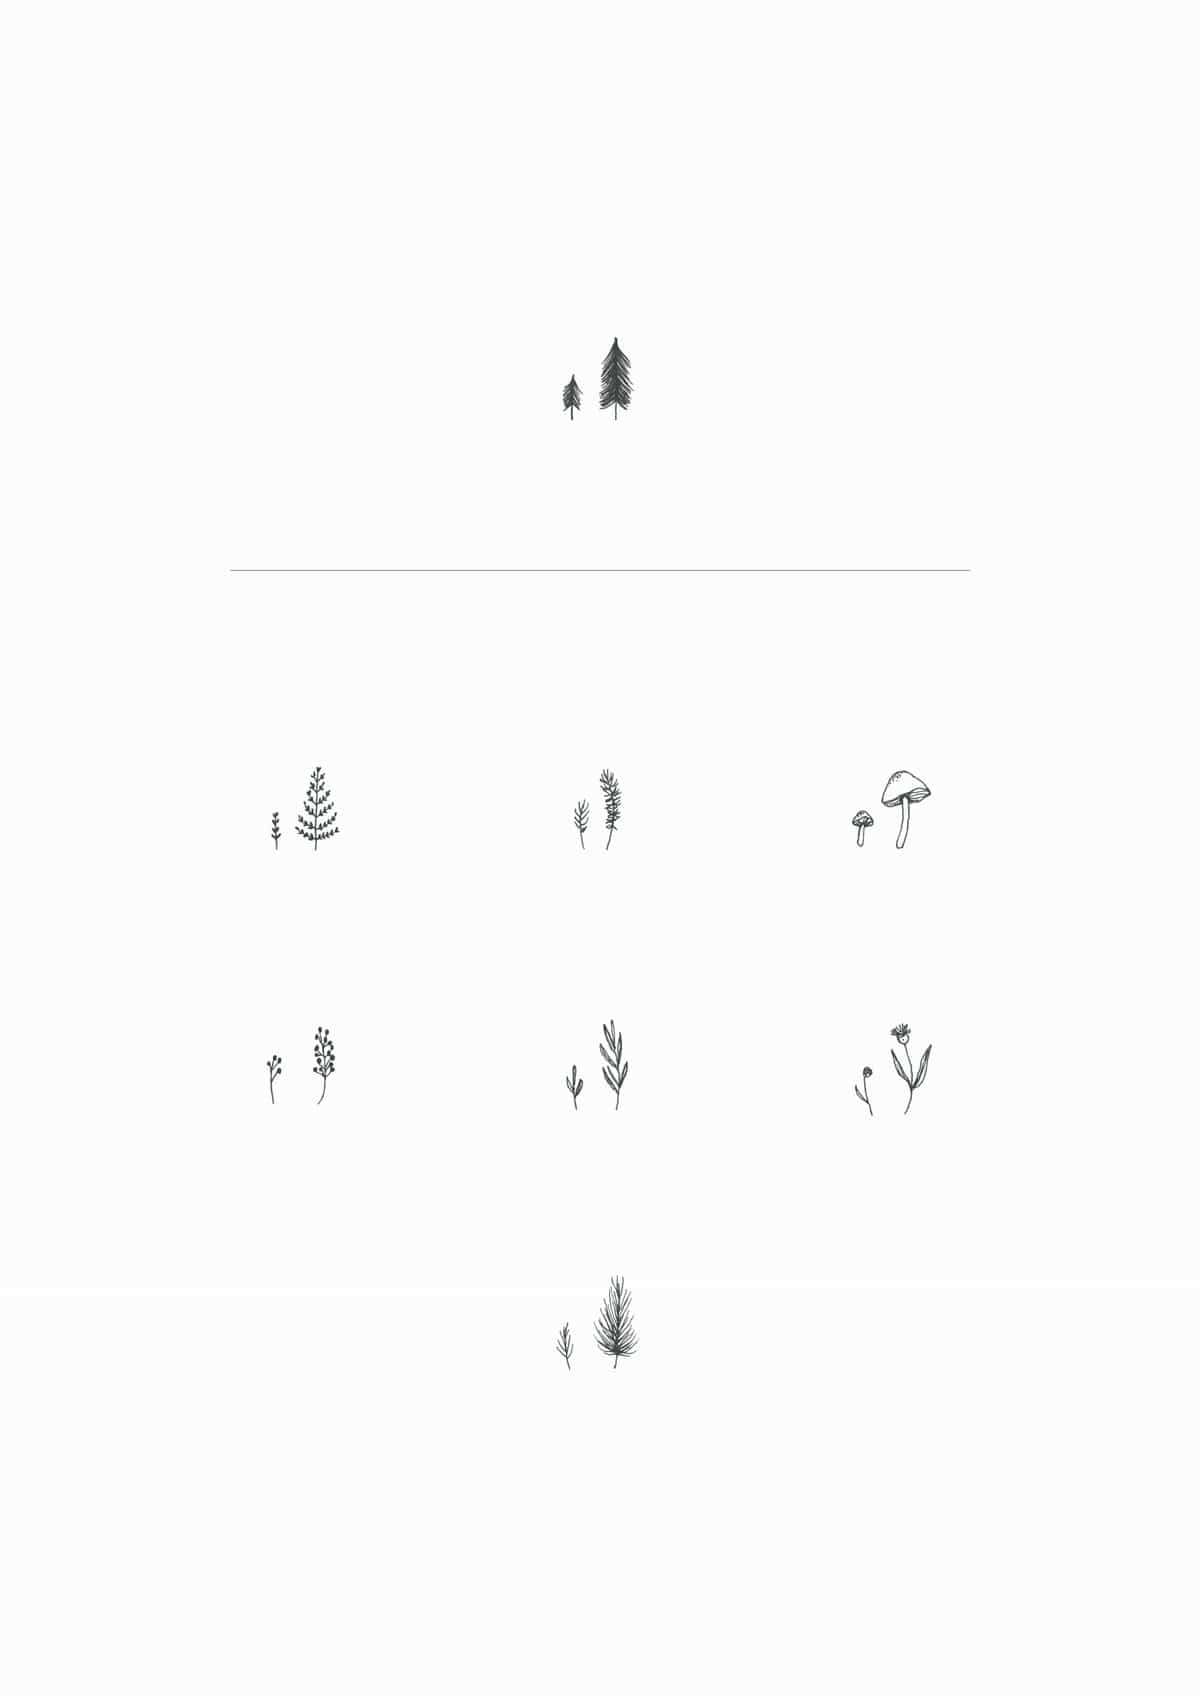 Madremania-Illustration-Board-Kinlake